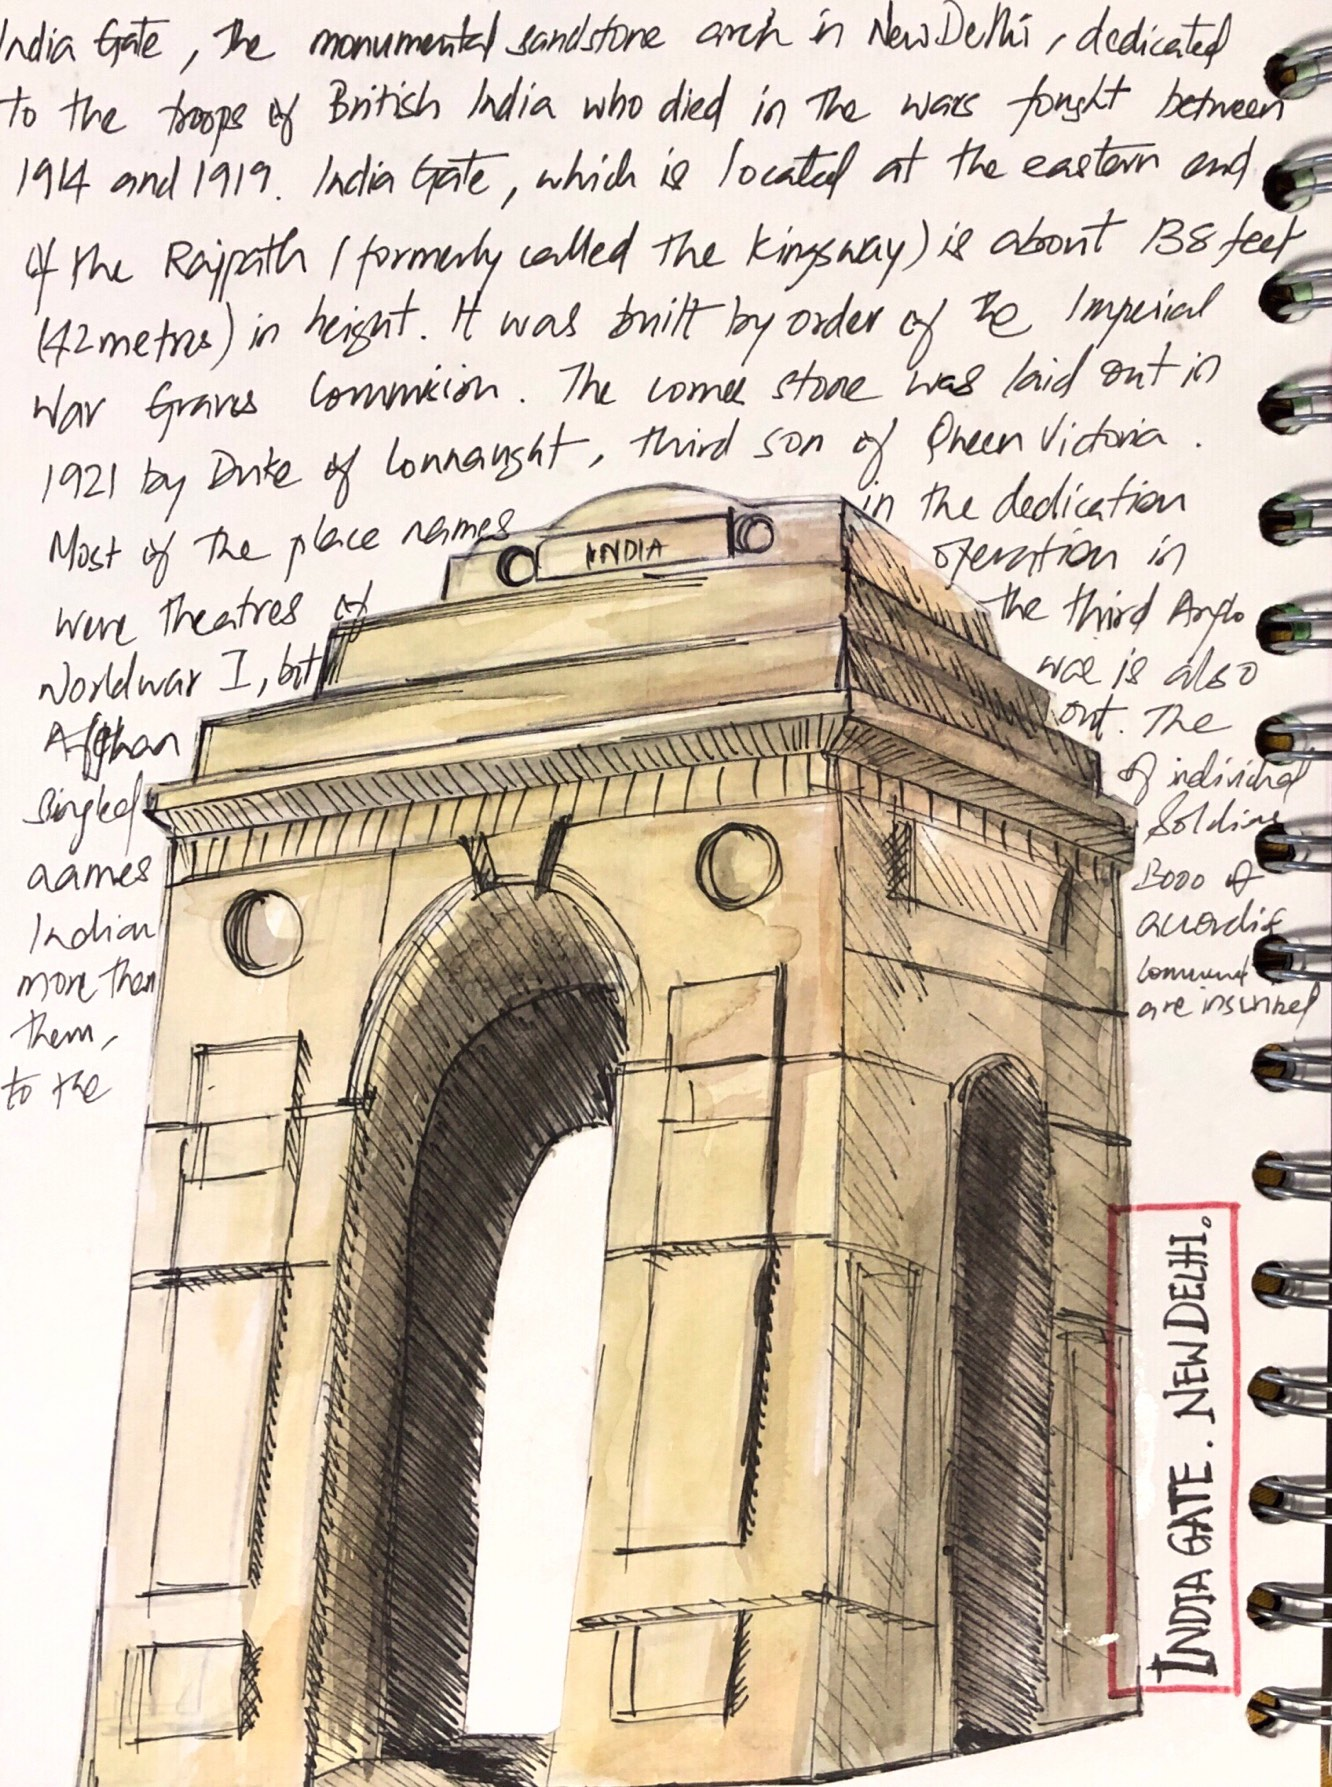 India-gate-delhi-sketch